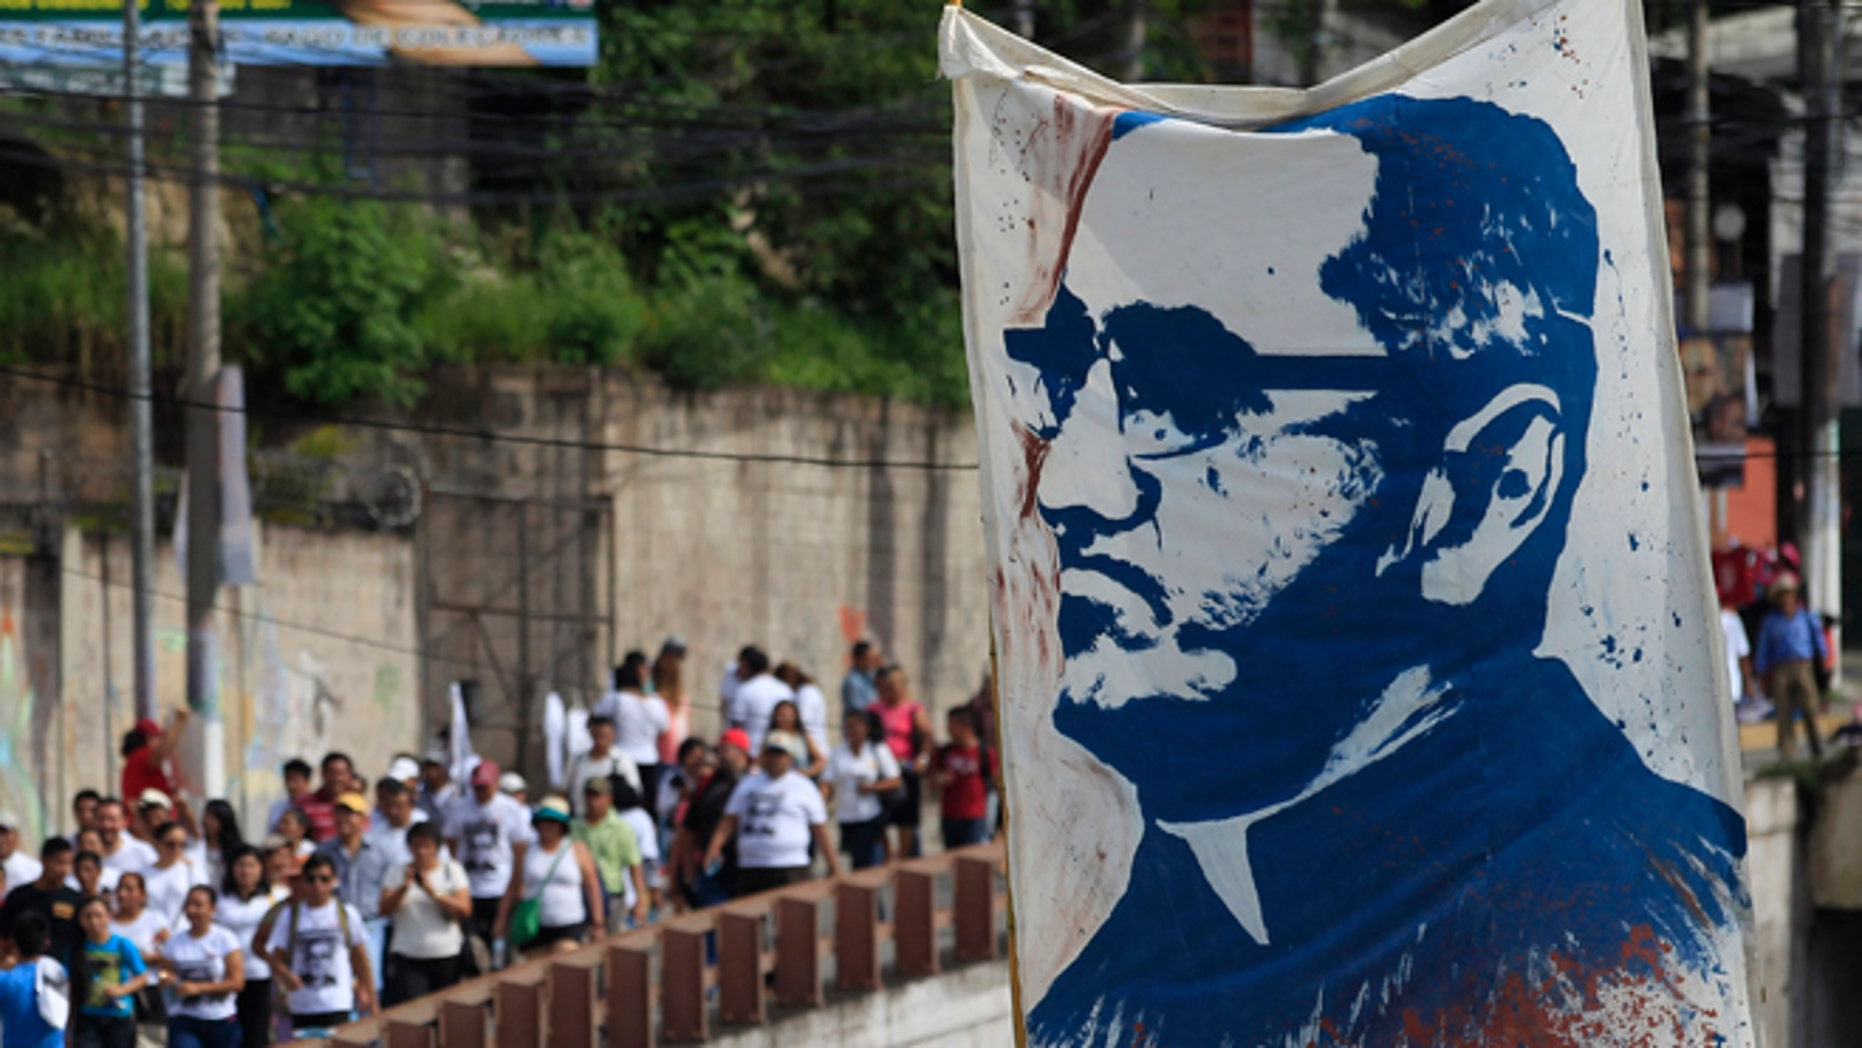 Pilgrims carry a portrait of Archbishop Oscar Romero in San Salvador, Saturday, May 23, 2015.